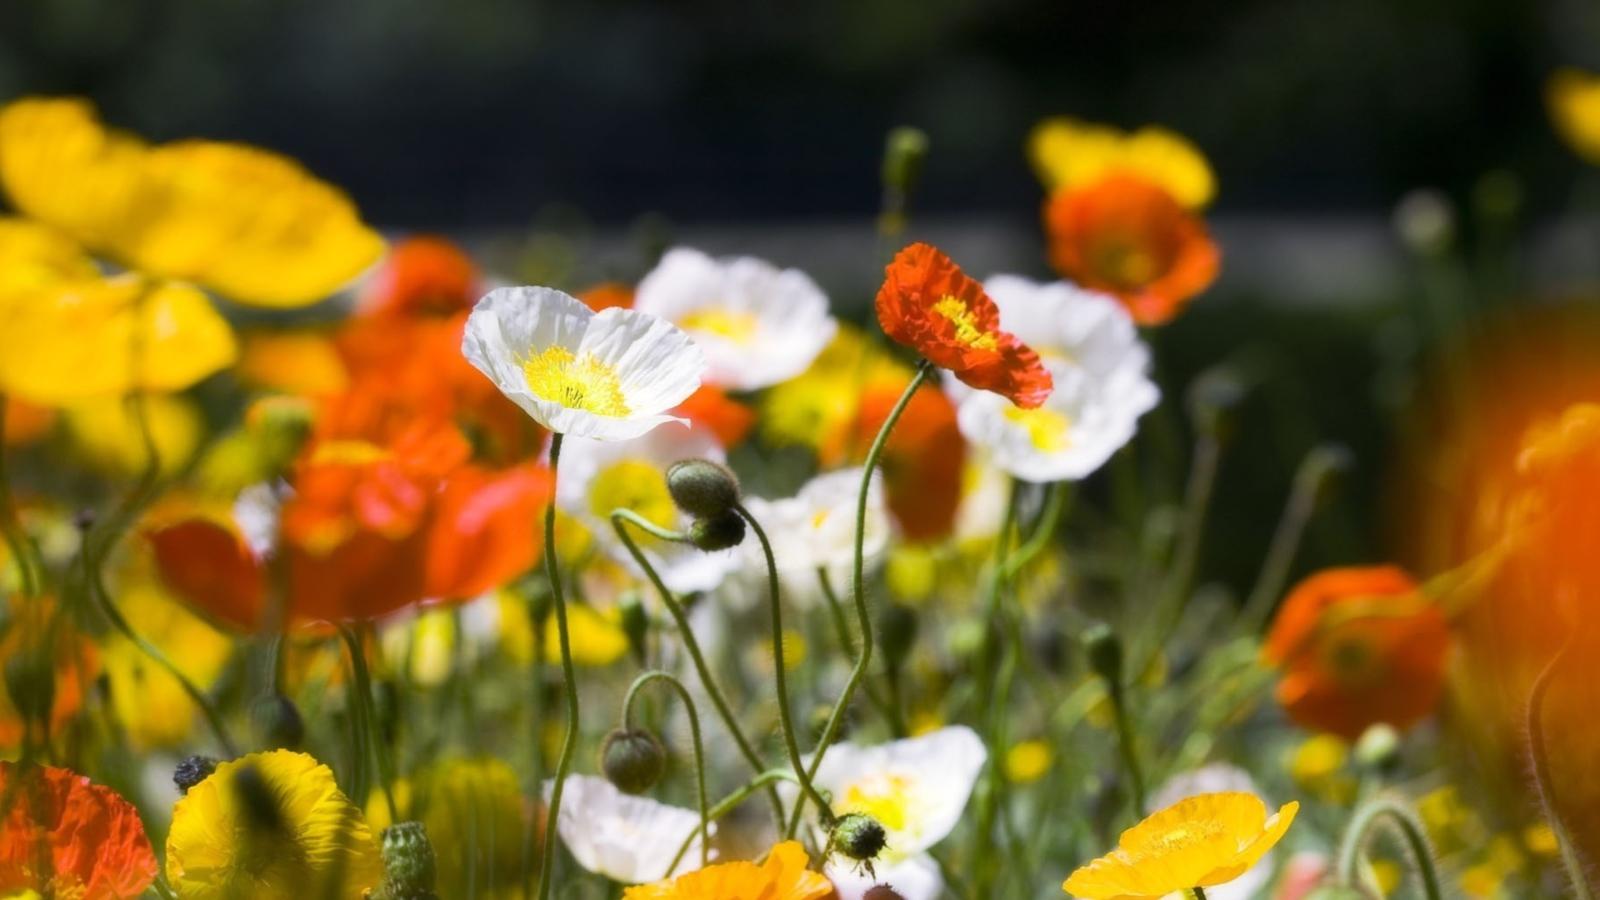 White Poppies Flowers